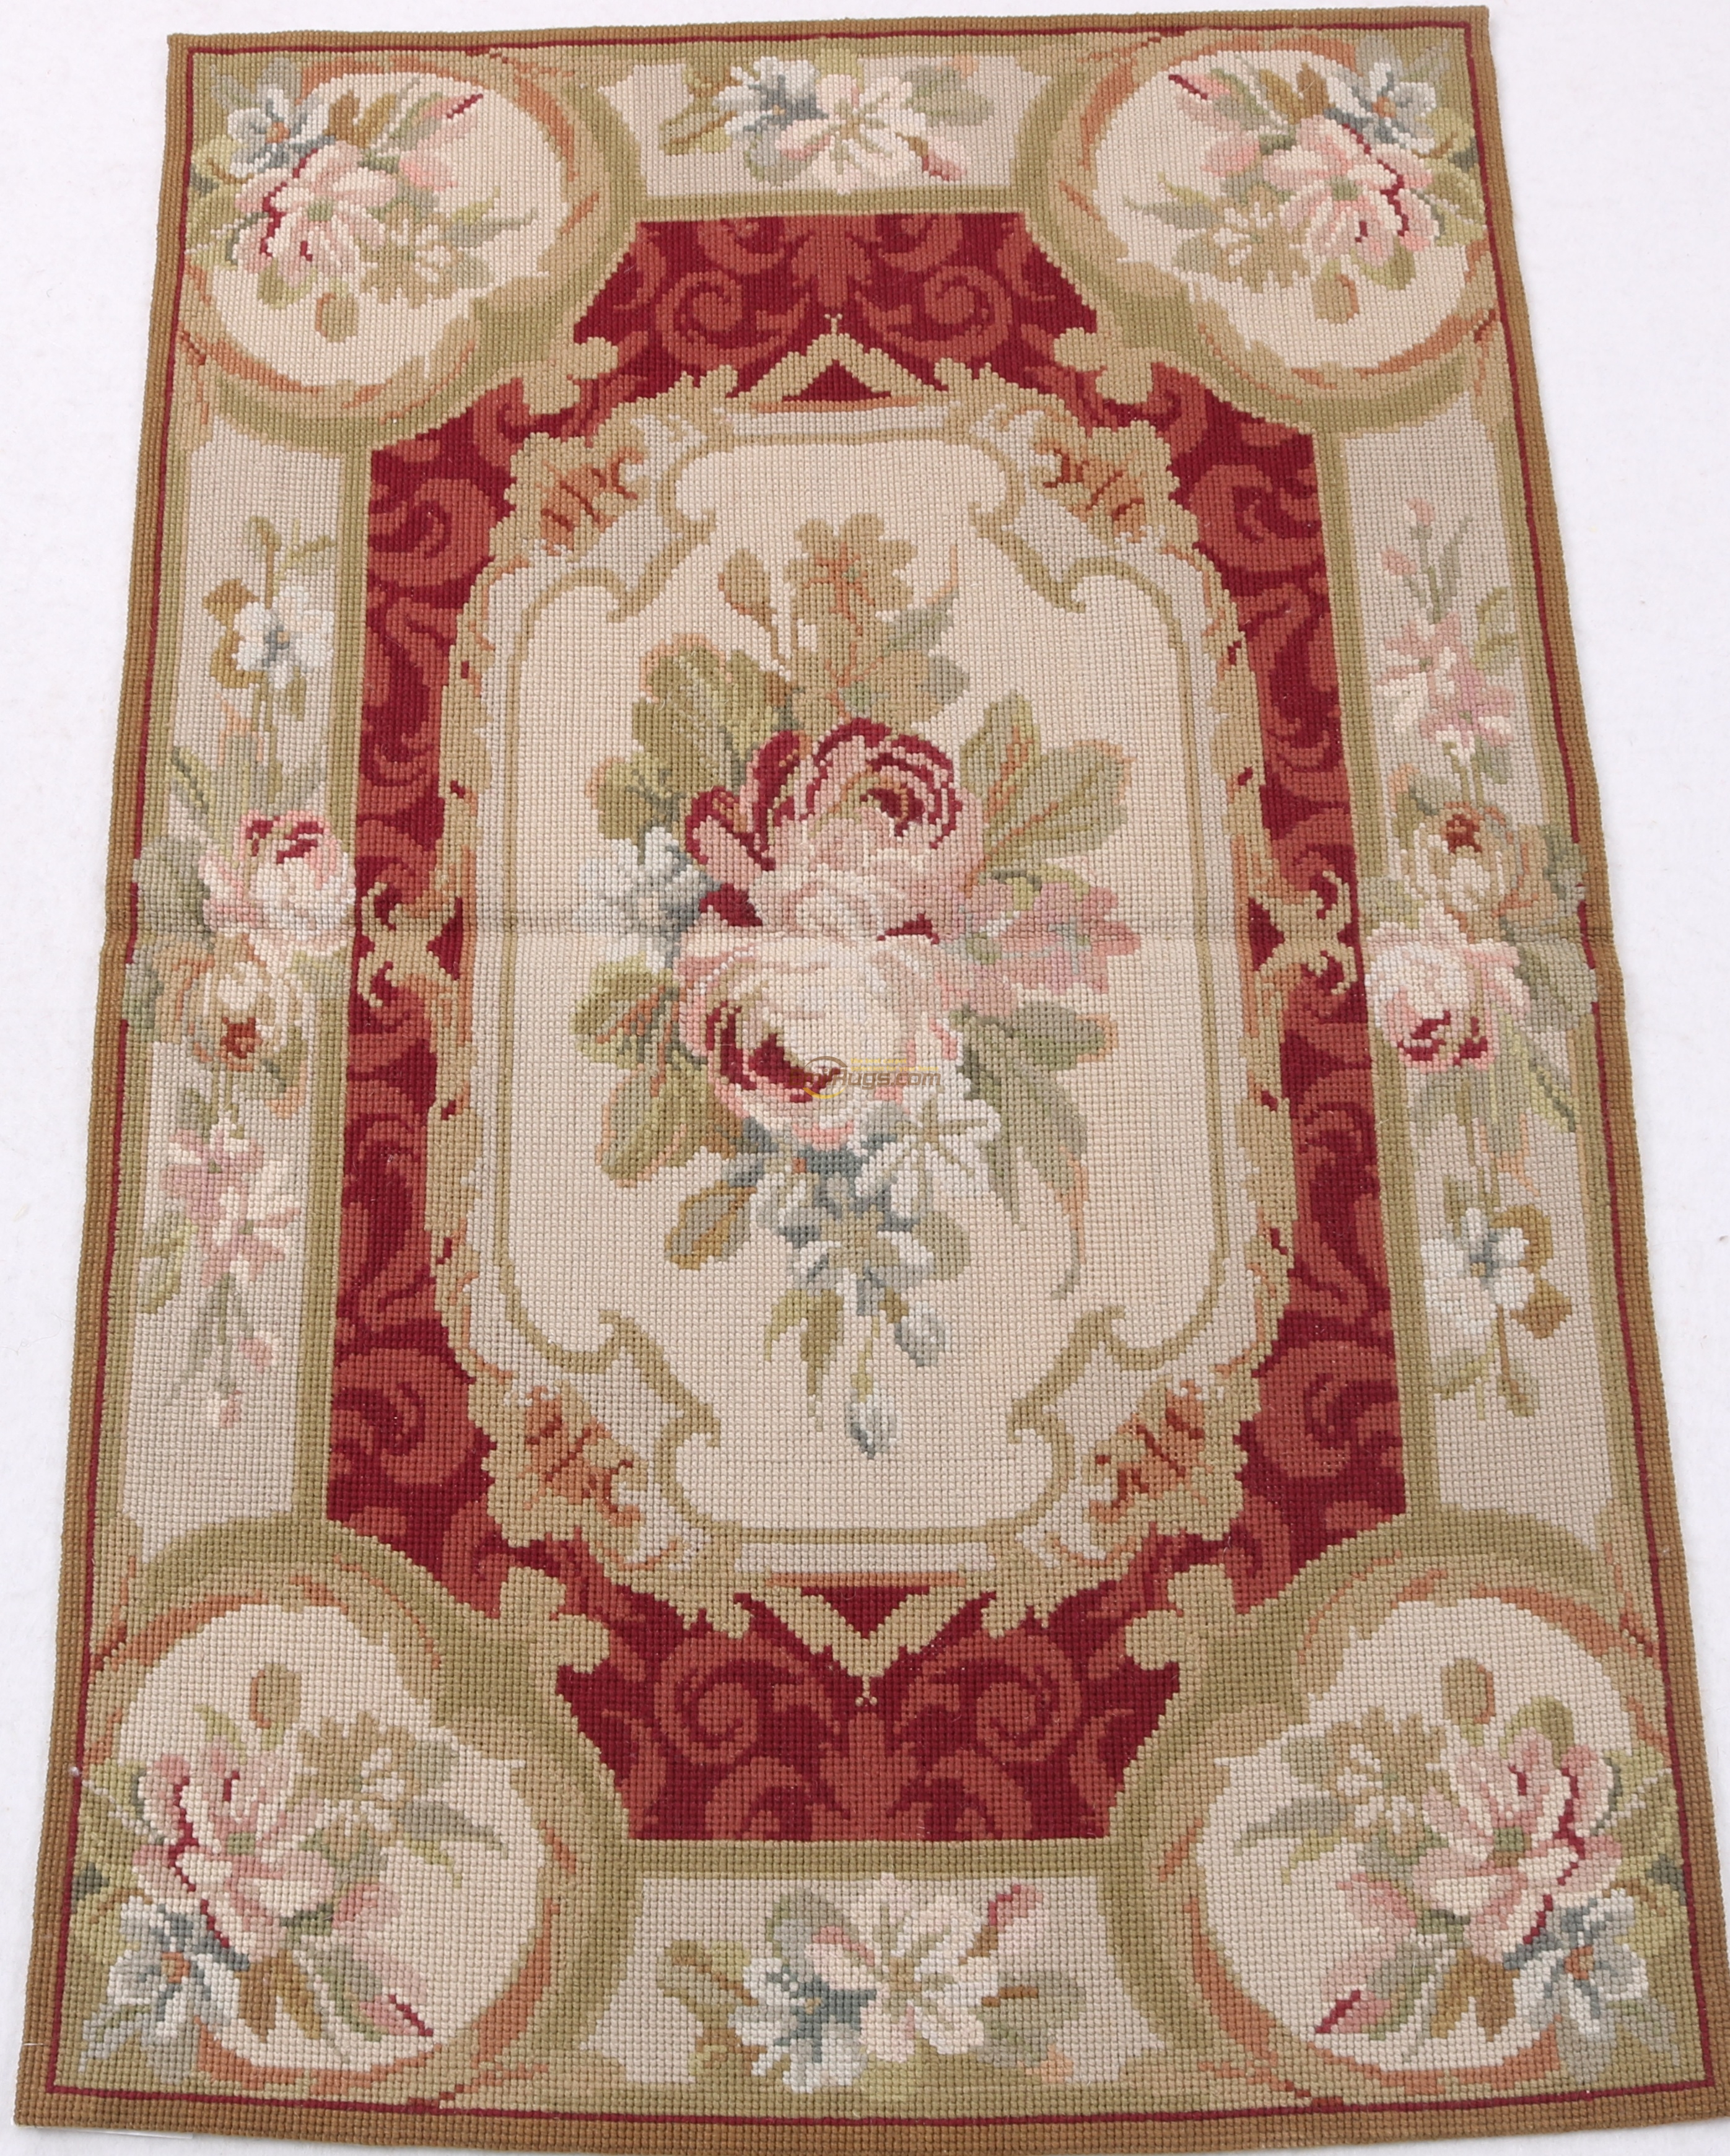 Tapis pour chambre aiguille tapis needleopint tapis 61 CM X 91 CM 2 'X 3' jardin Anglais yk005 2x3gc165yg8